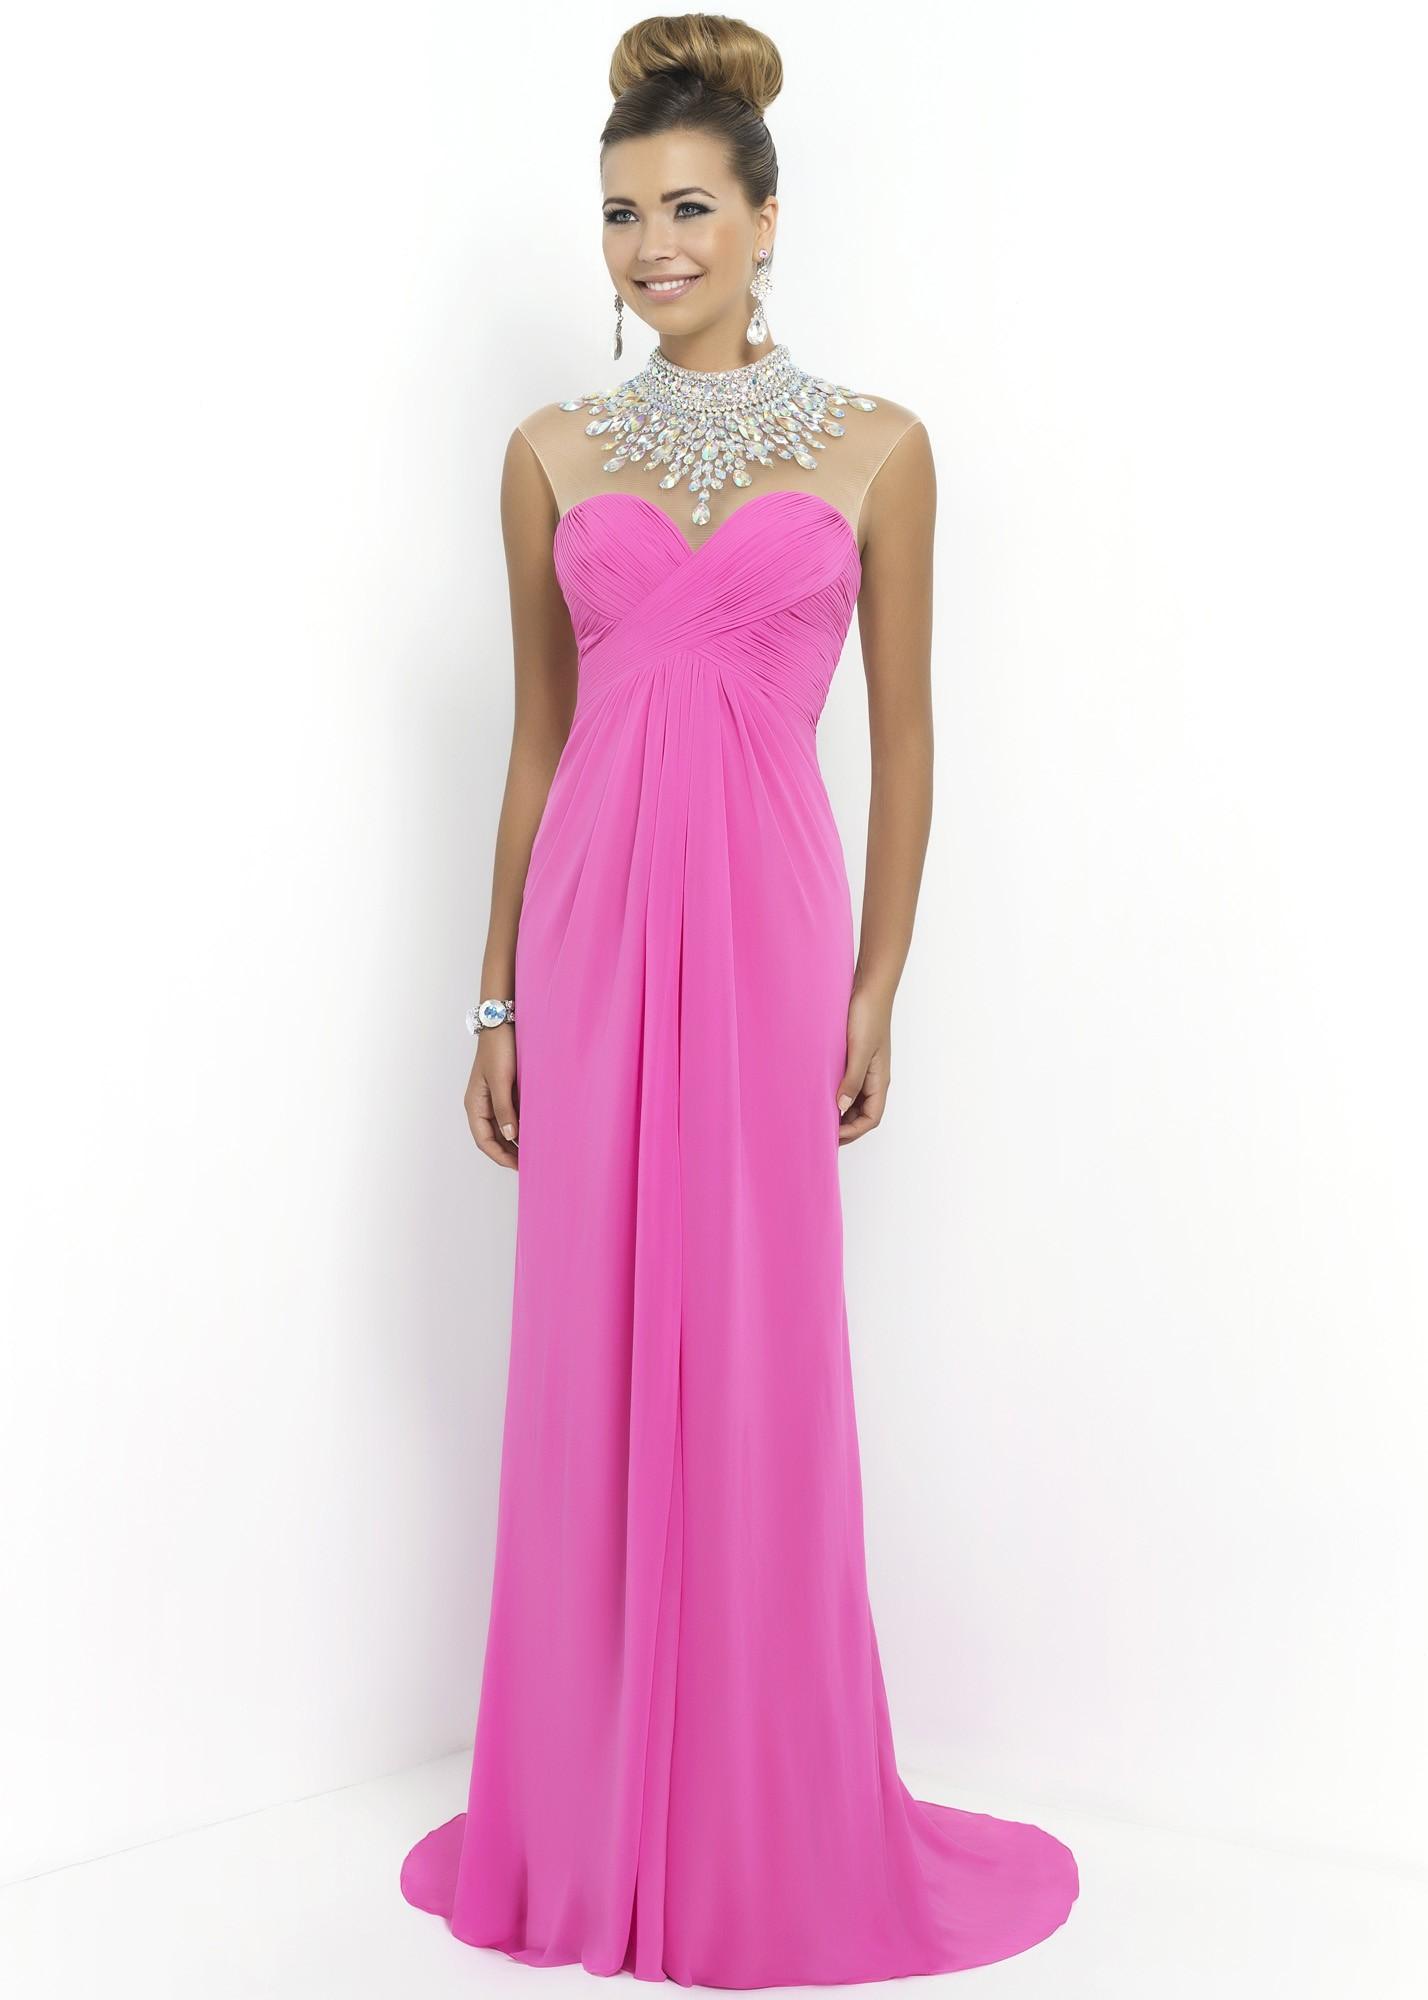 Blush 9952 - Petunia Beaded Illusion Chiffon Prom Gown - RissyRoos.com